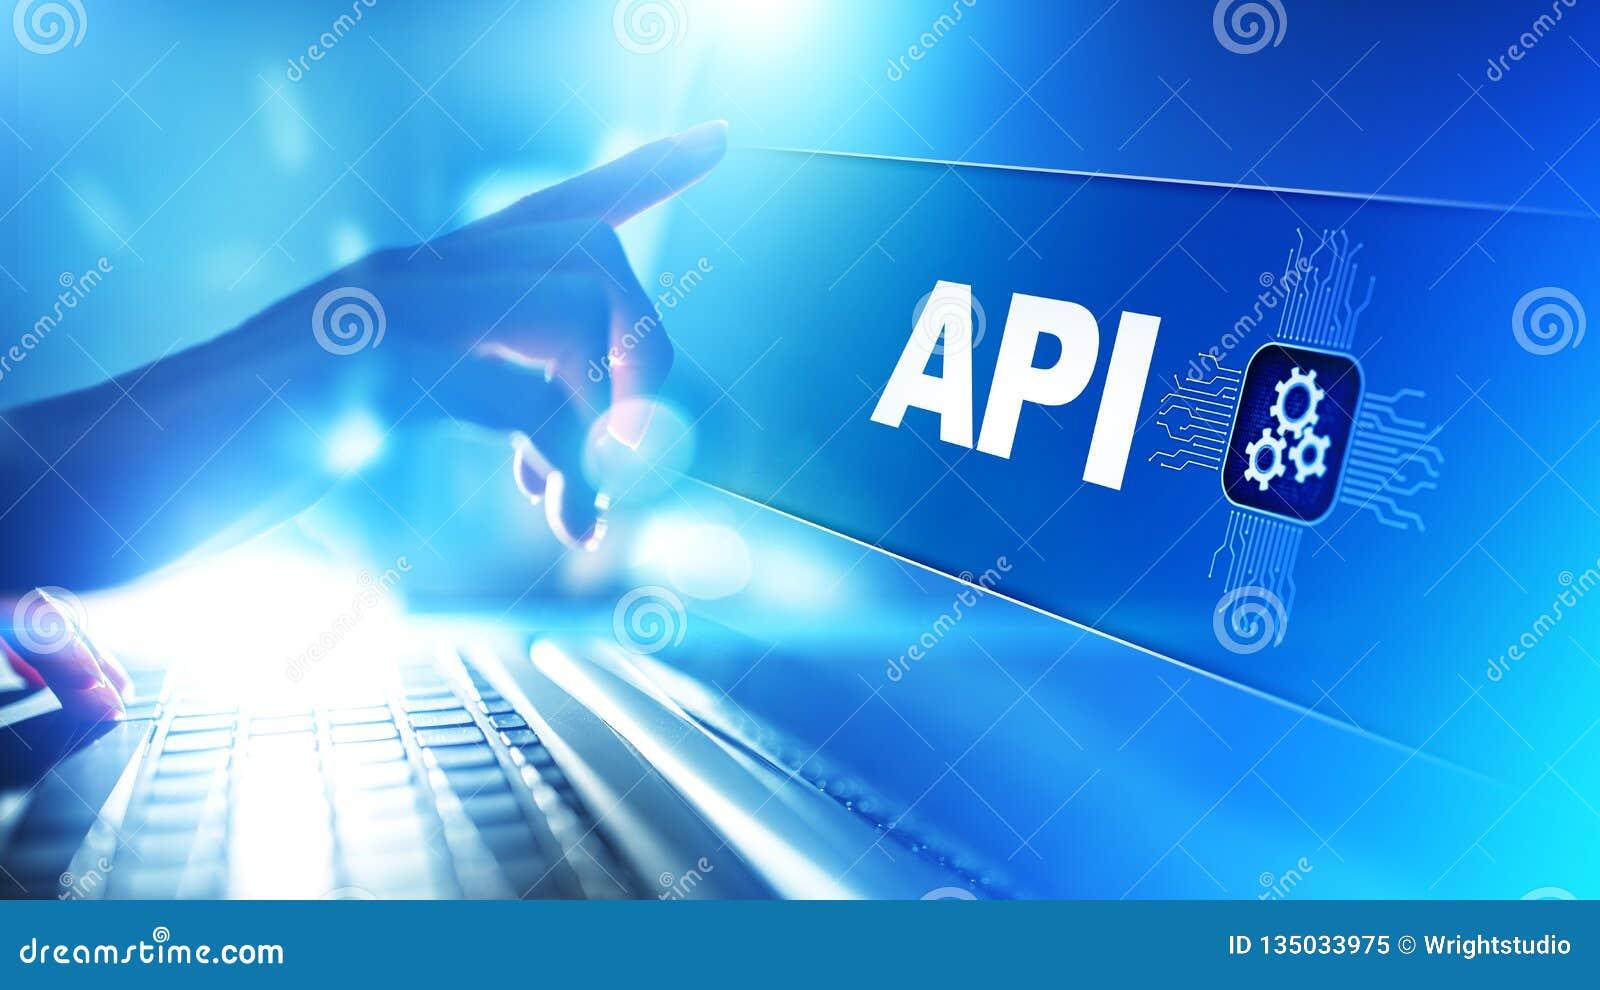 API - Application programming interface, software-ontwikkelinghulpmiddel, informatietechnologie en bedrijfsconcept